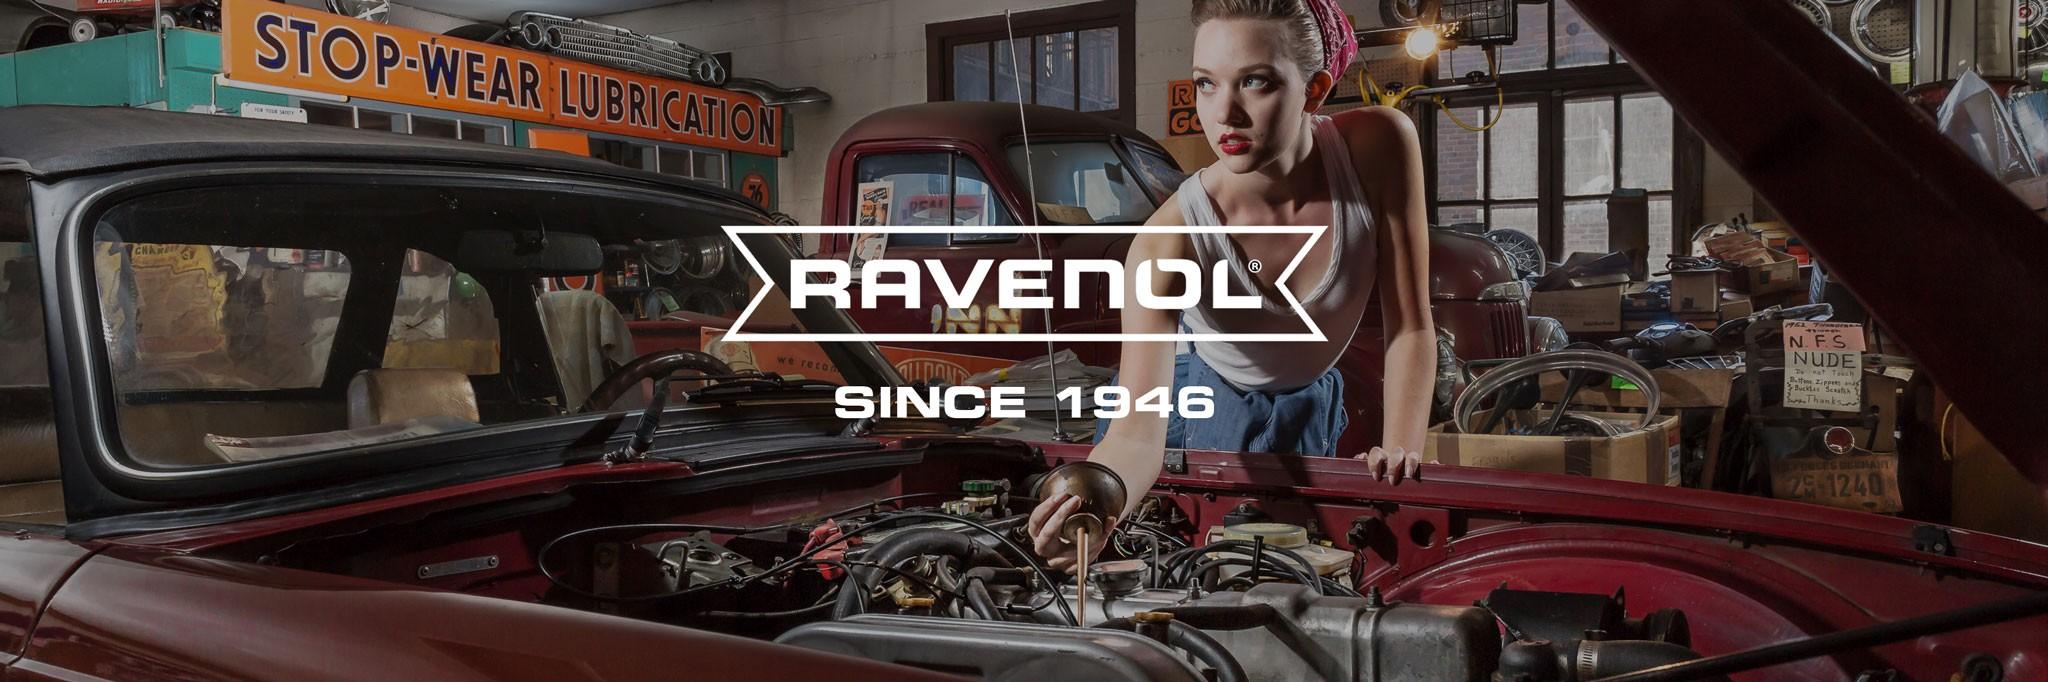 www.ravenol.si